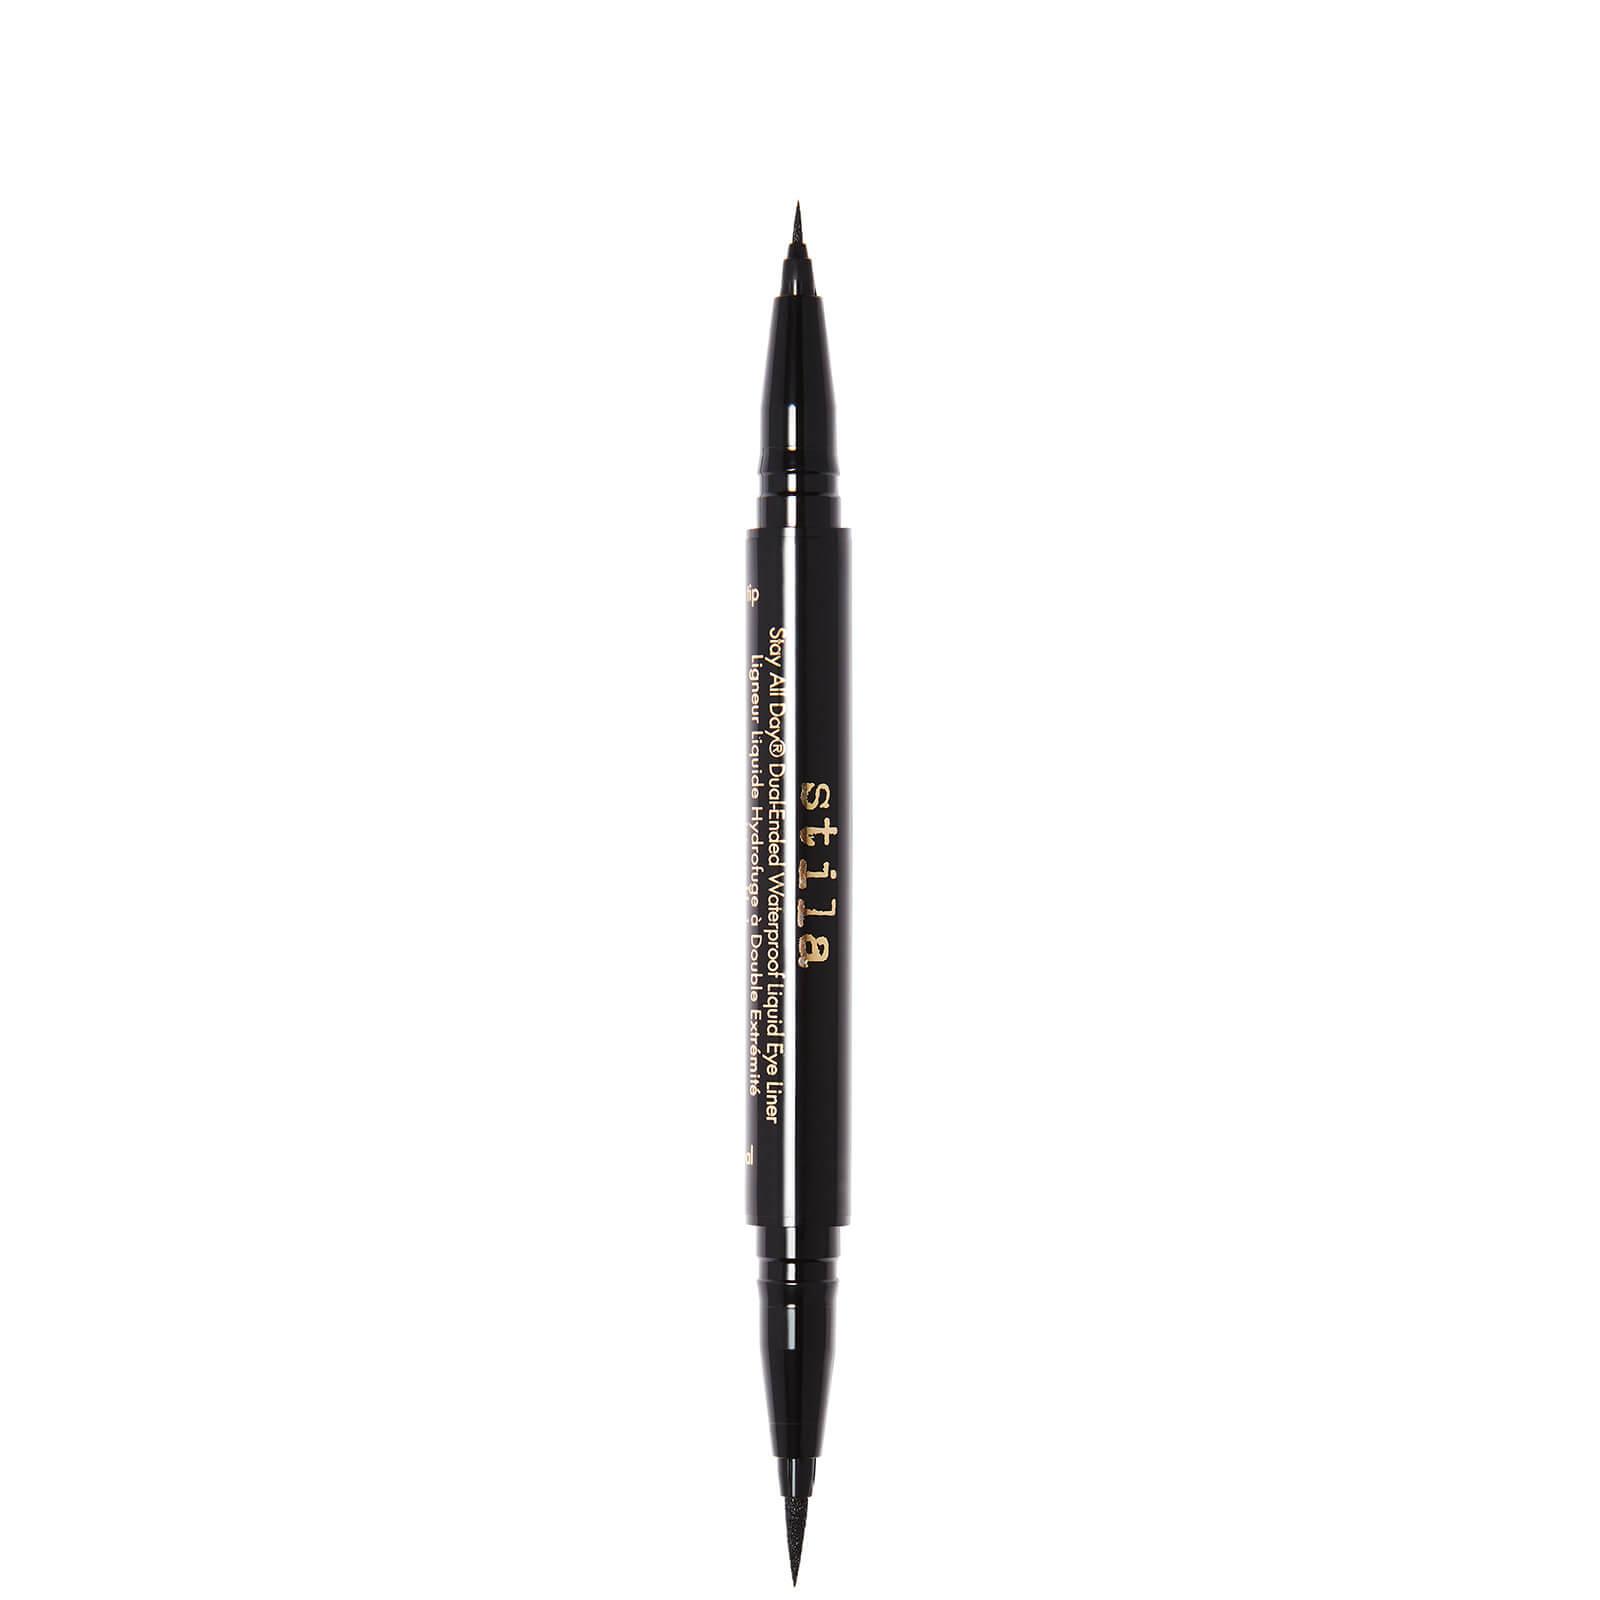 Купить Stila Stay All Day® Dual-Ended Waterproof Liquid Eye Liner 1ml (Various Shades) - Intense Black